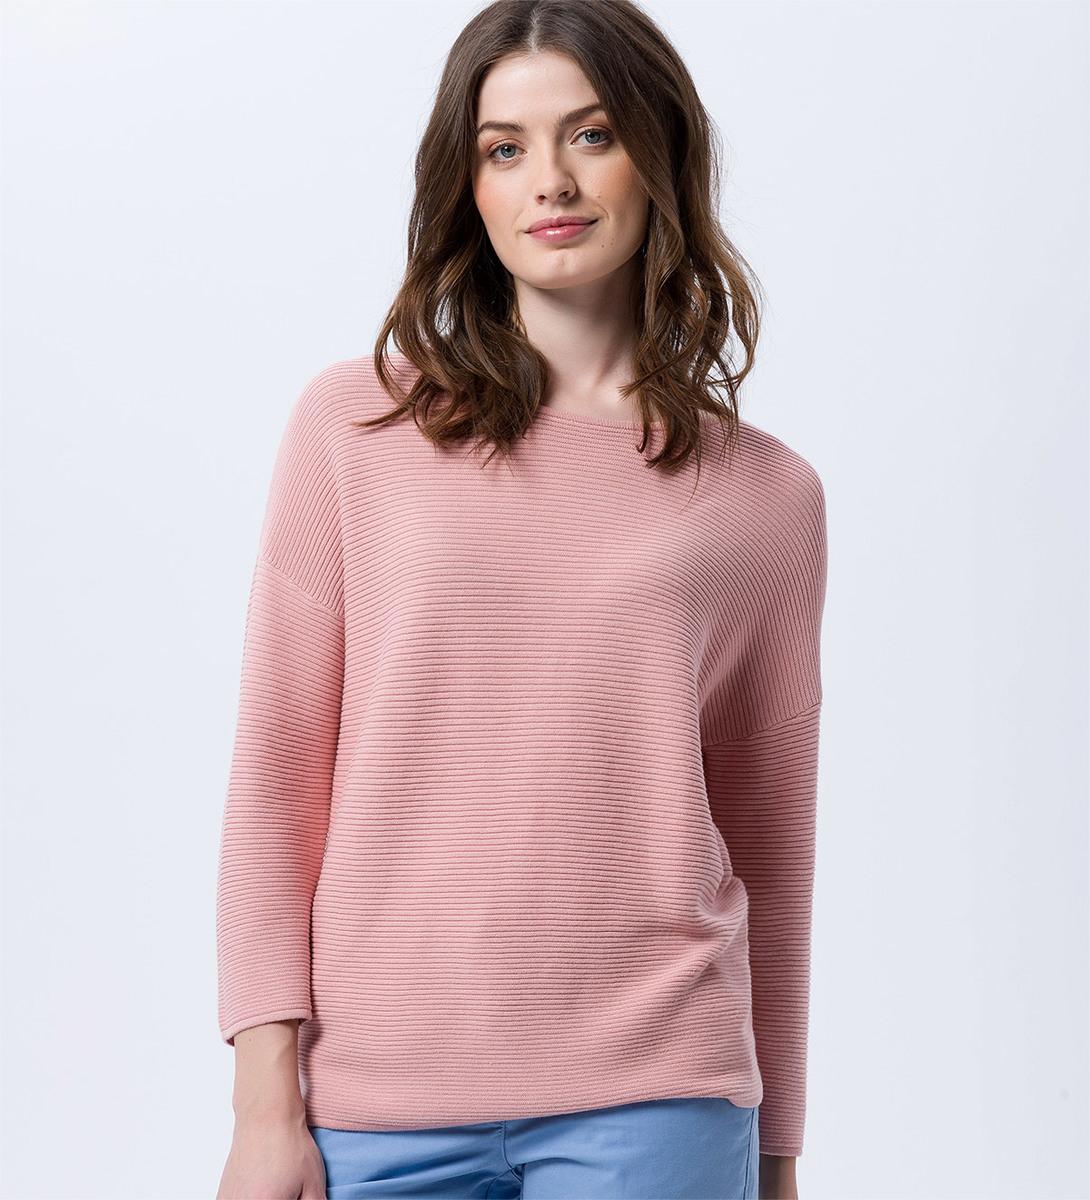 Pullover in Ripp-Optik in dusty pink